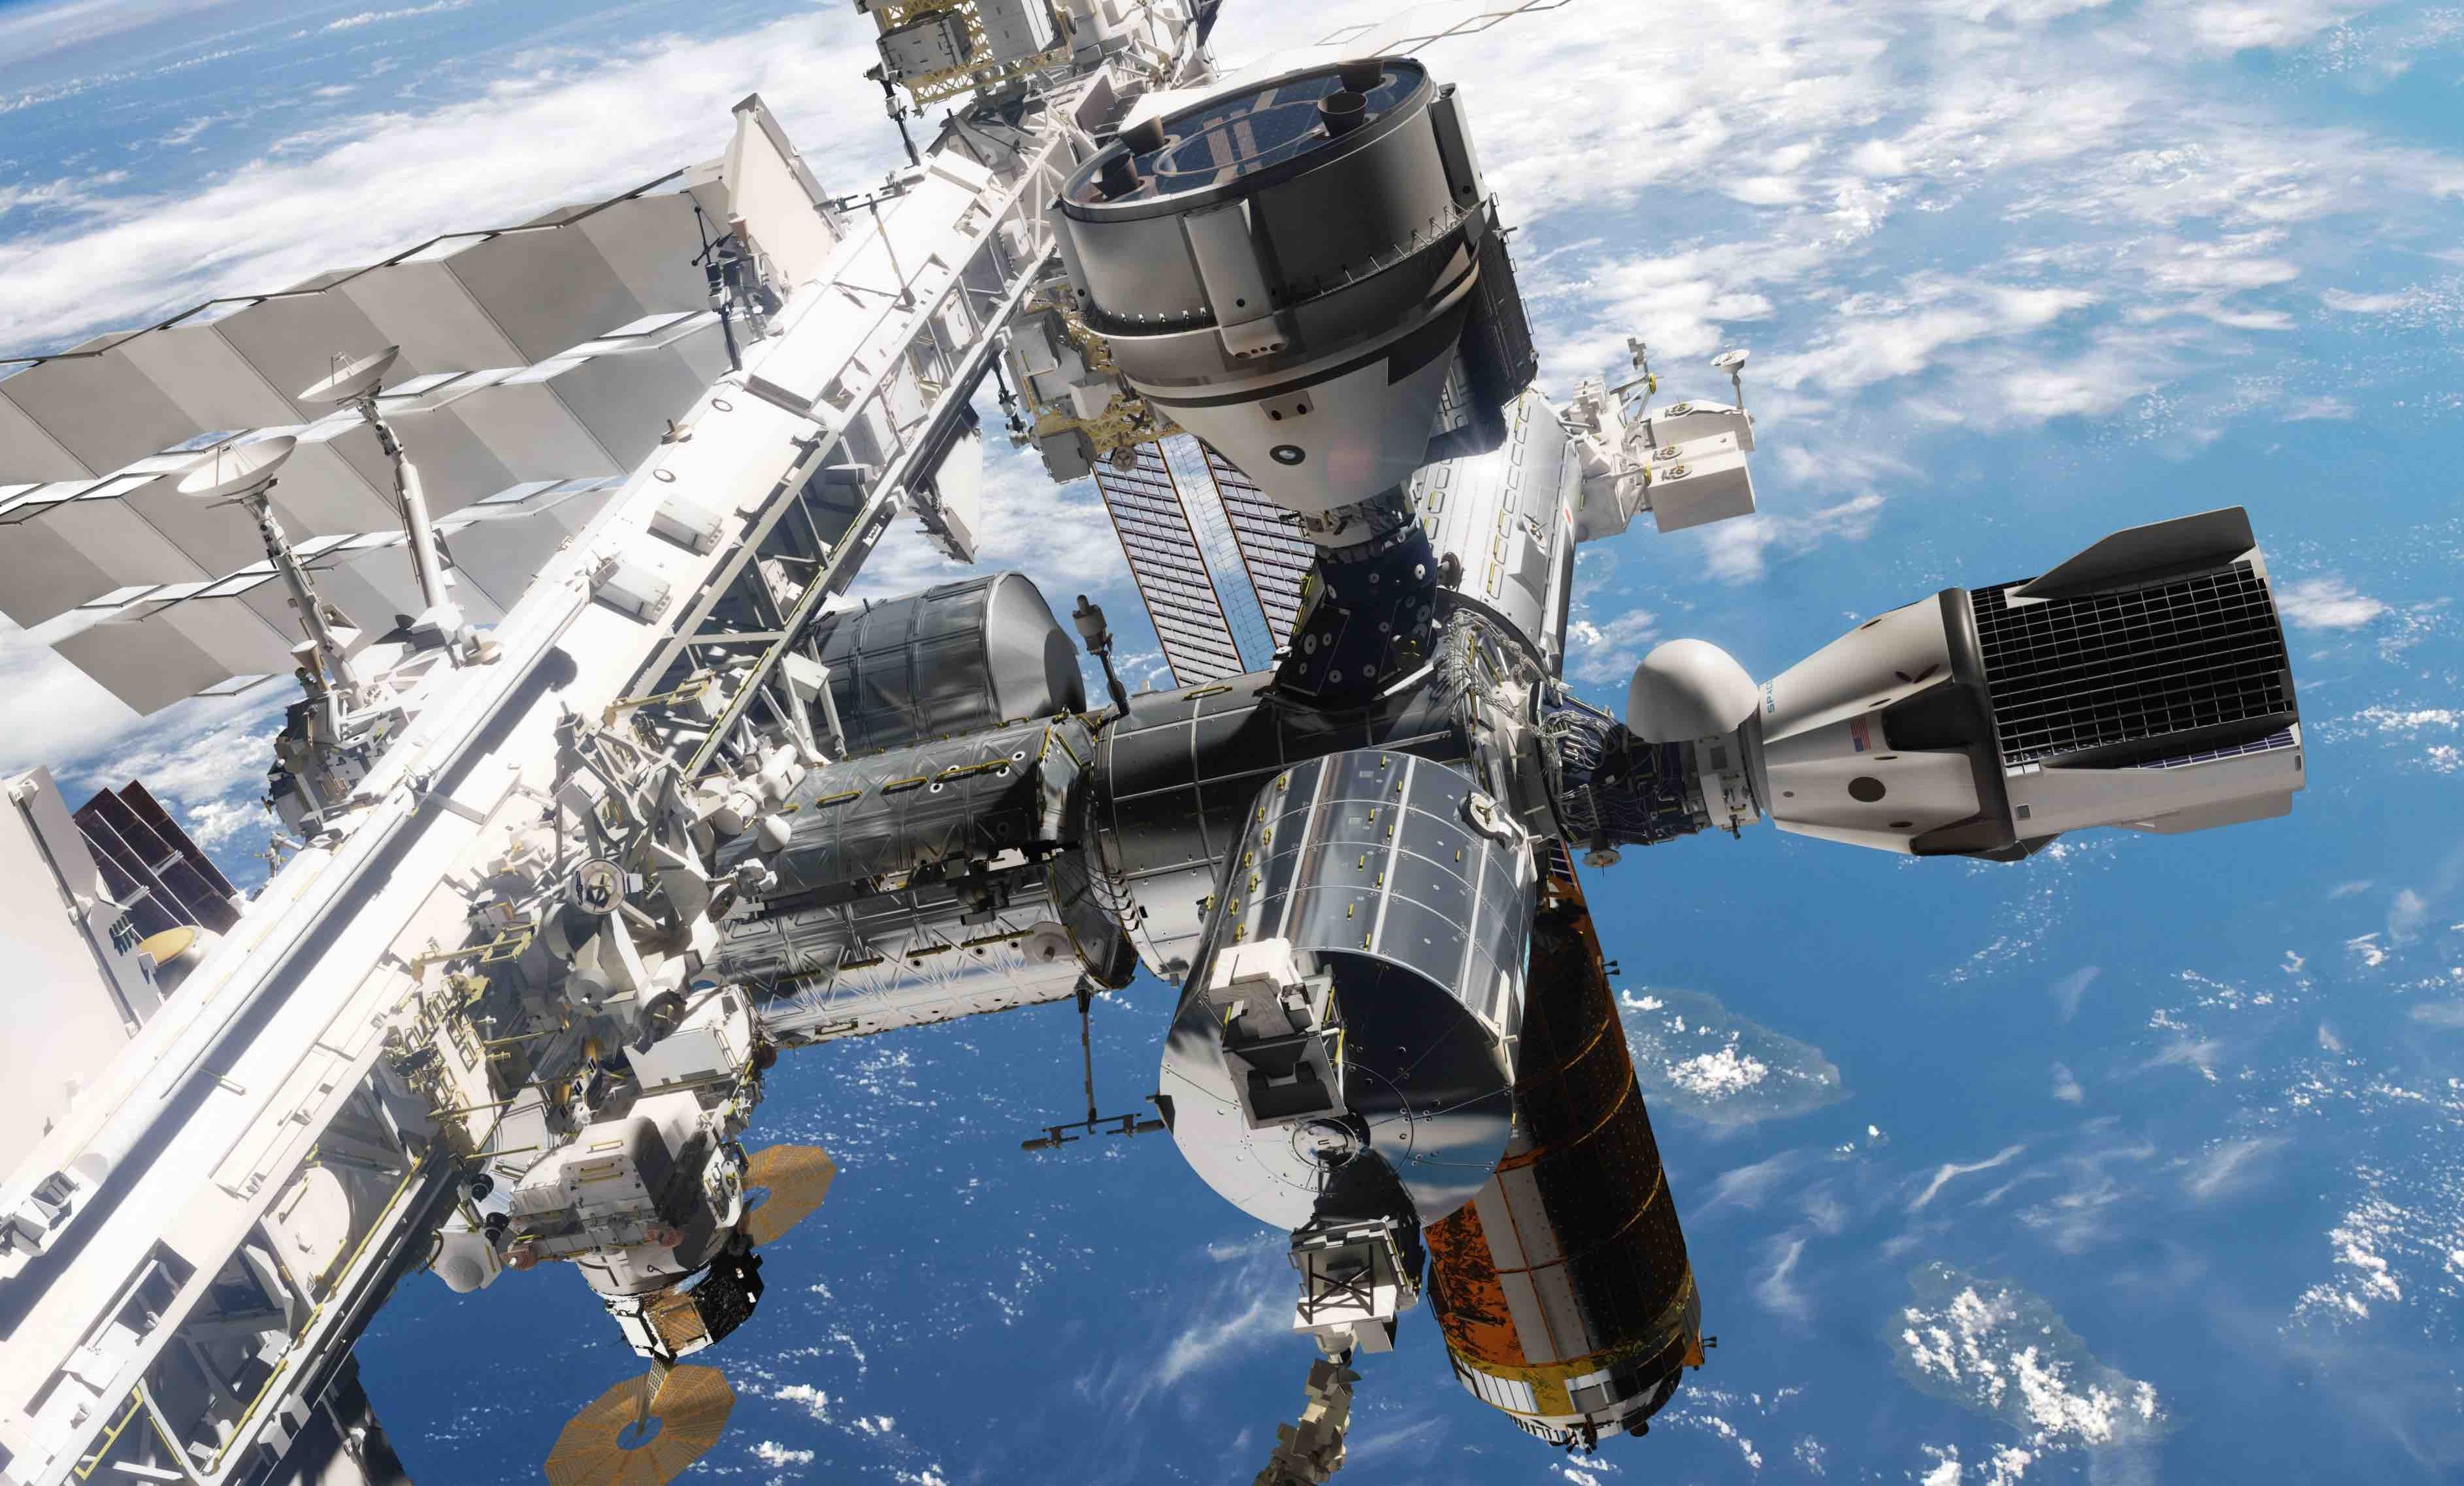 NAC provides Starliner, Dragon 2 update - Commercial Crew preps